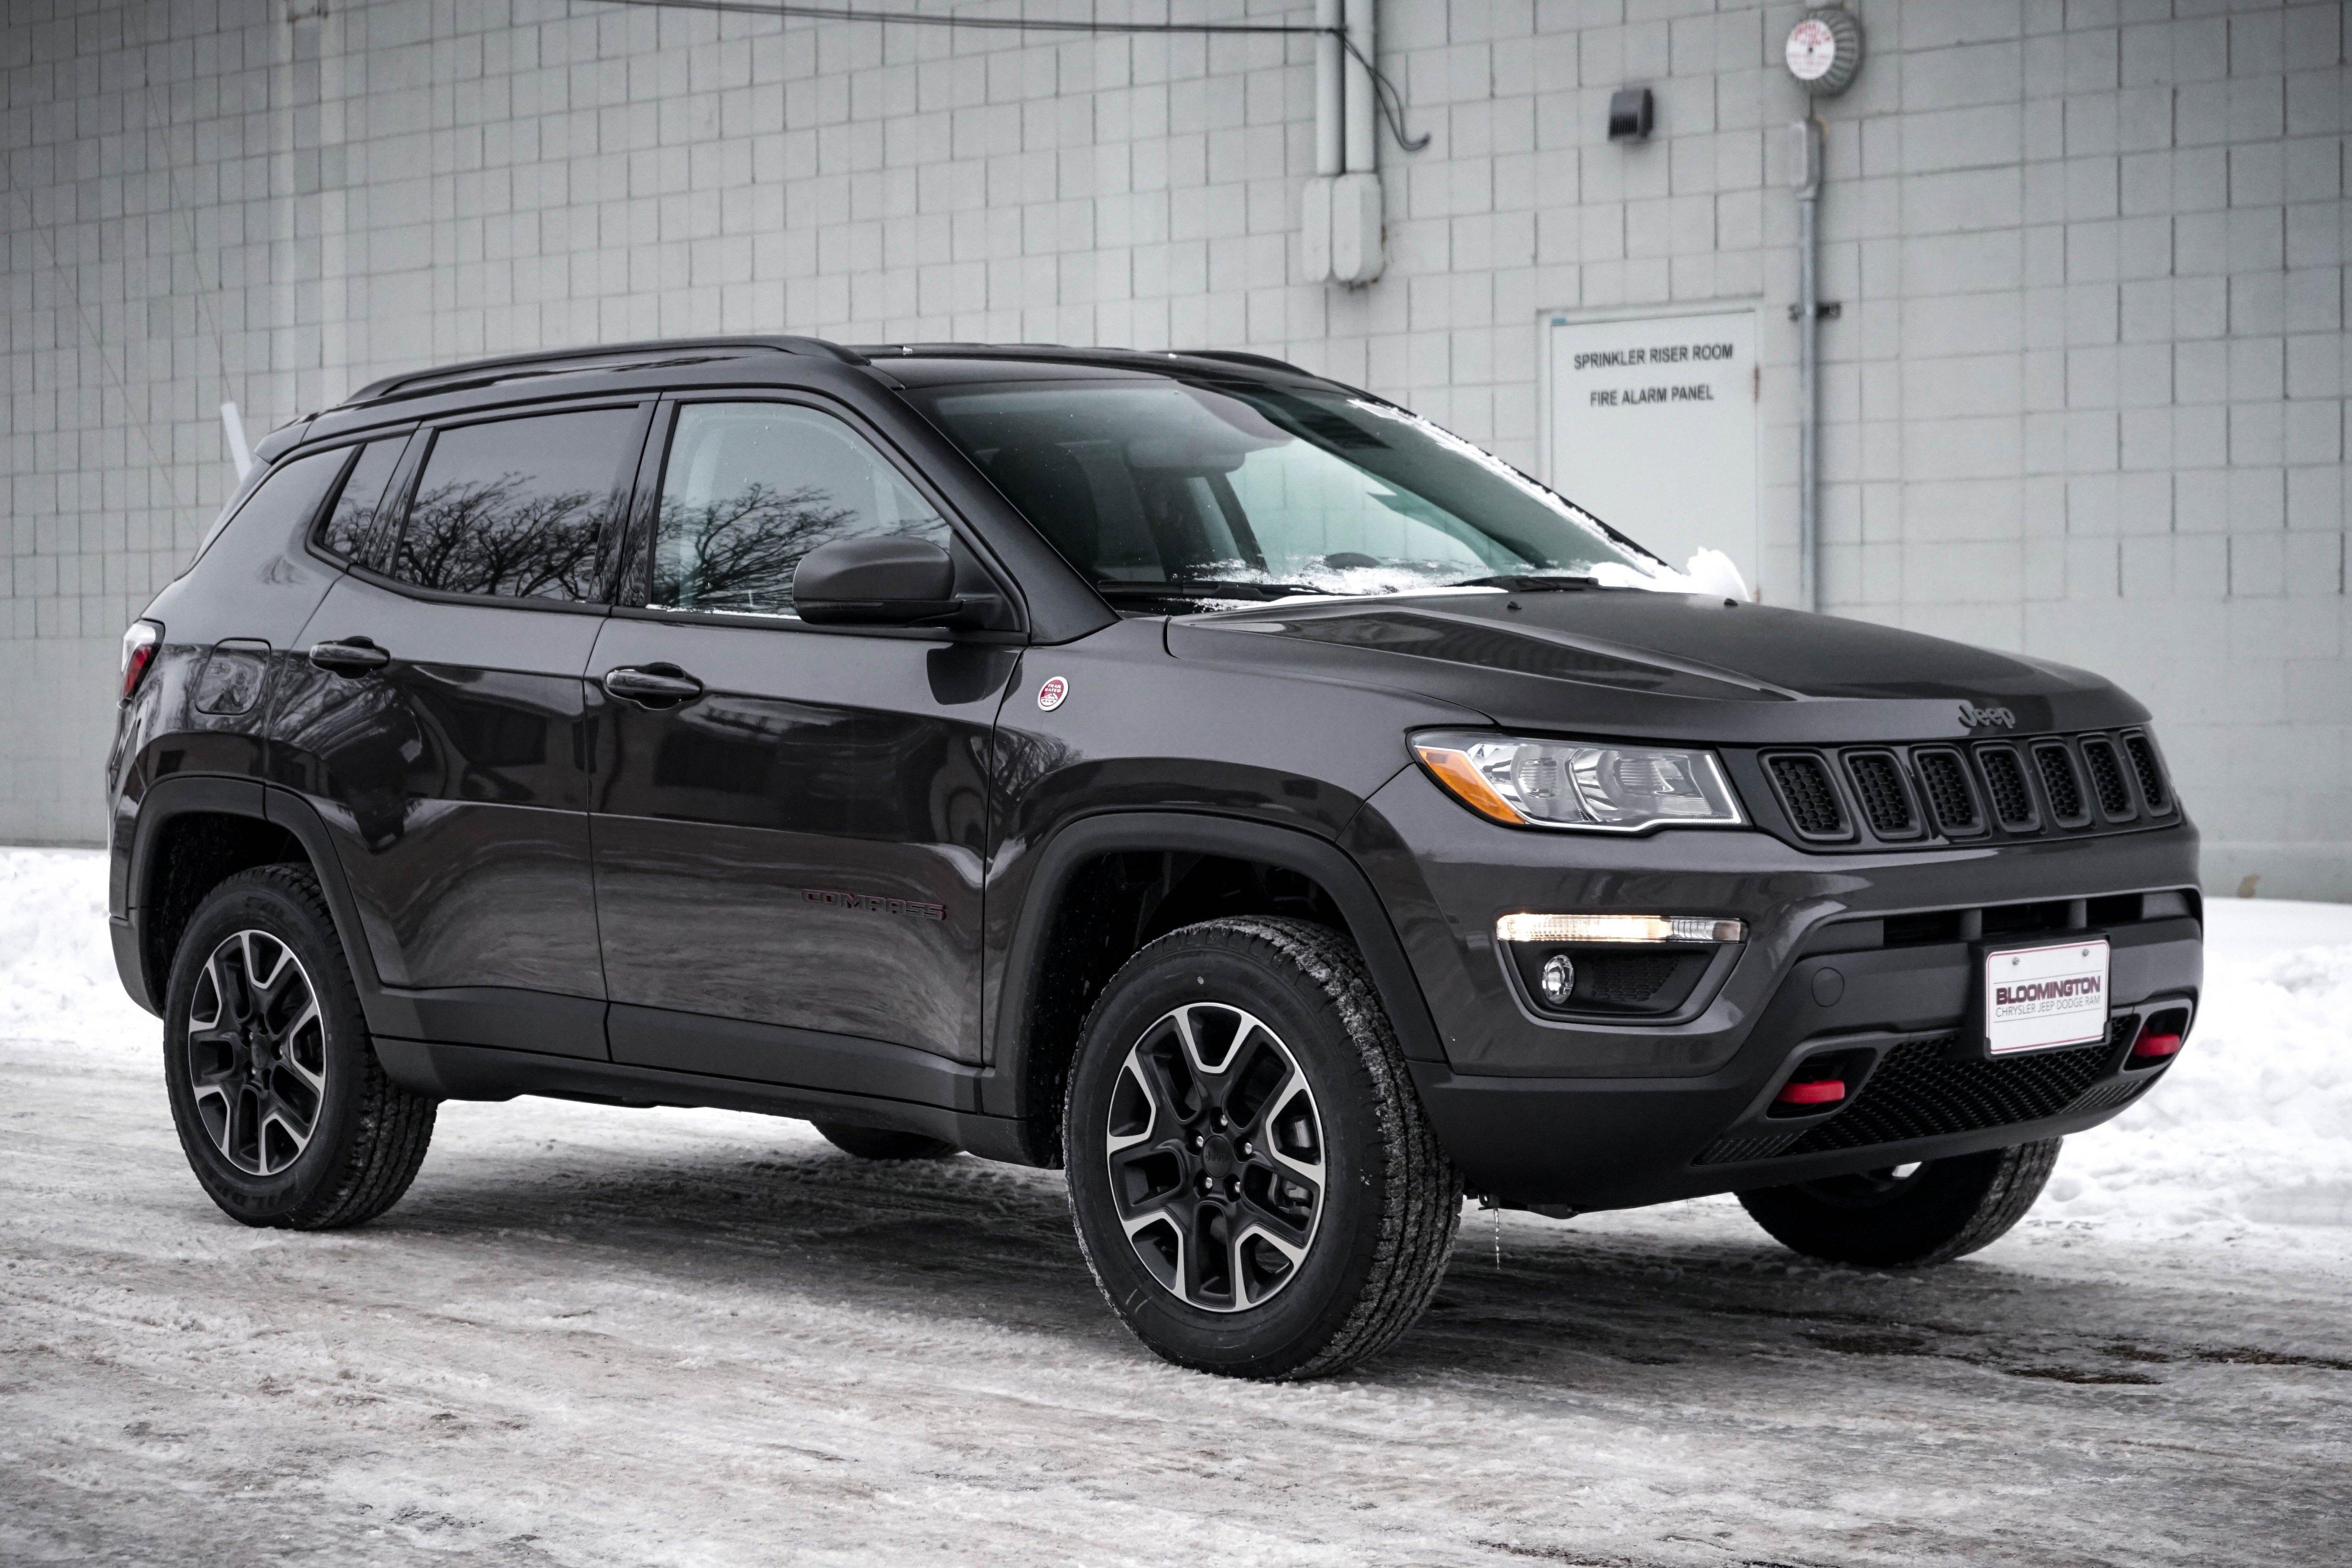 New 2020 Jeep Compass Trailhawk